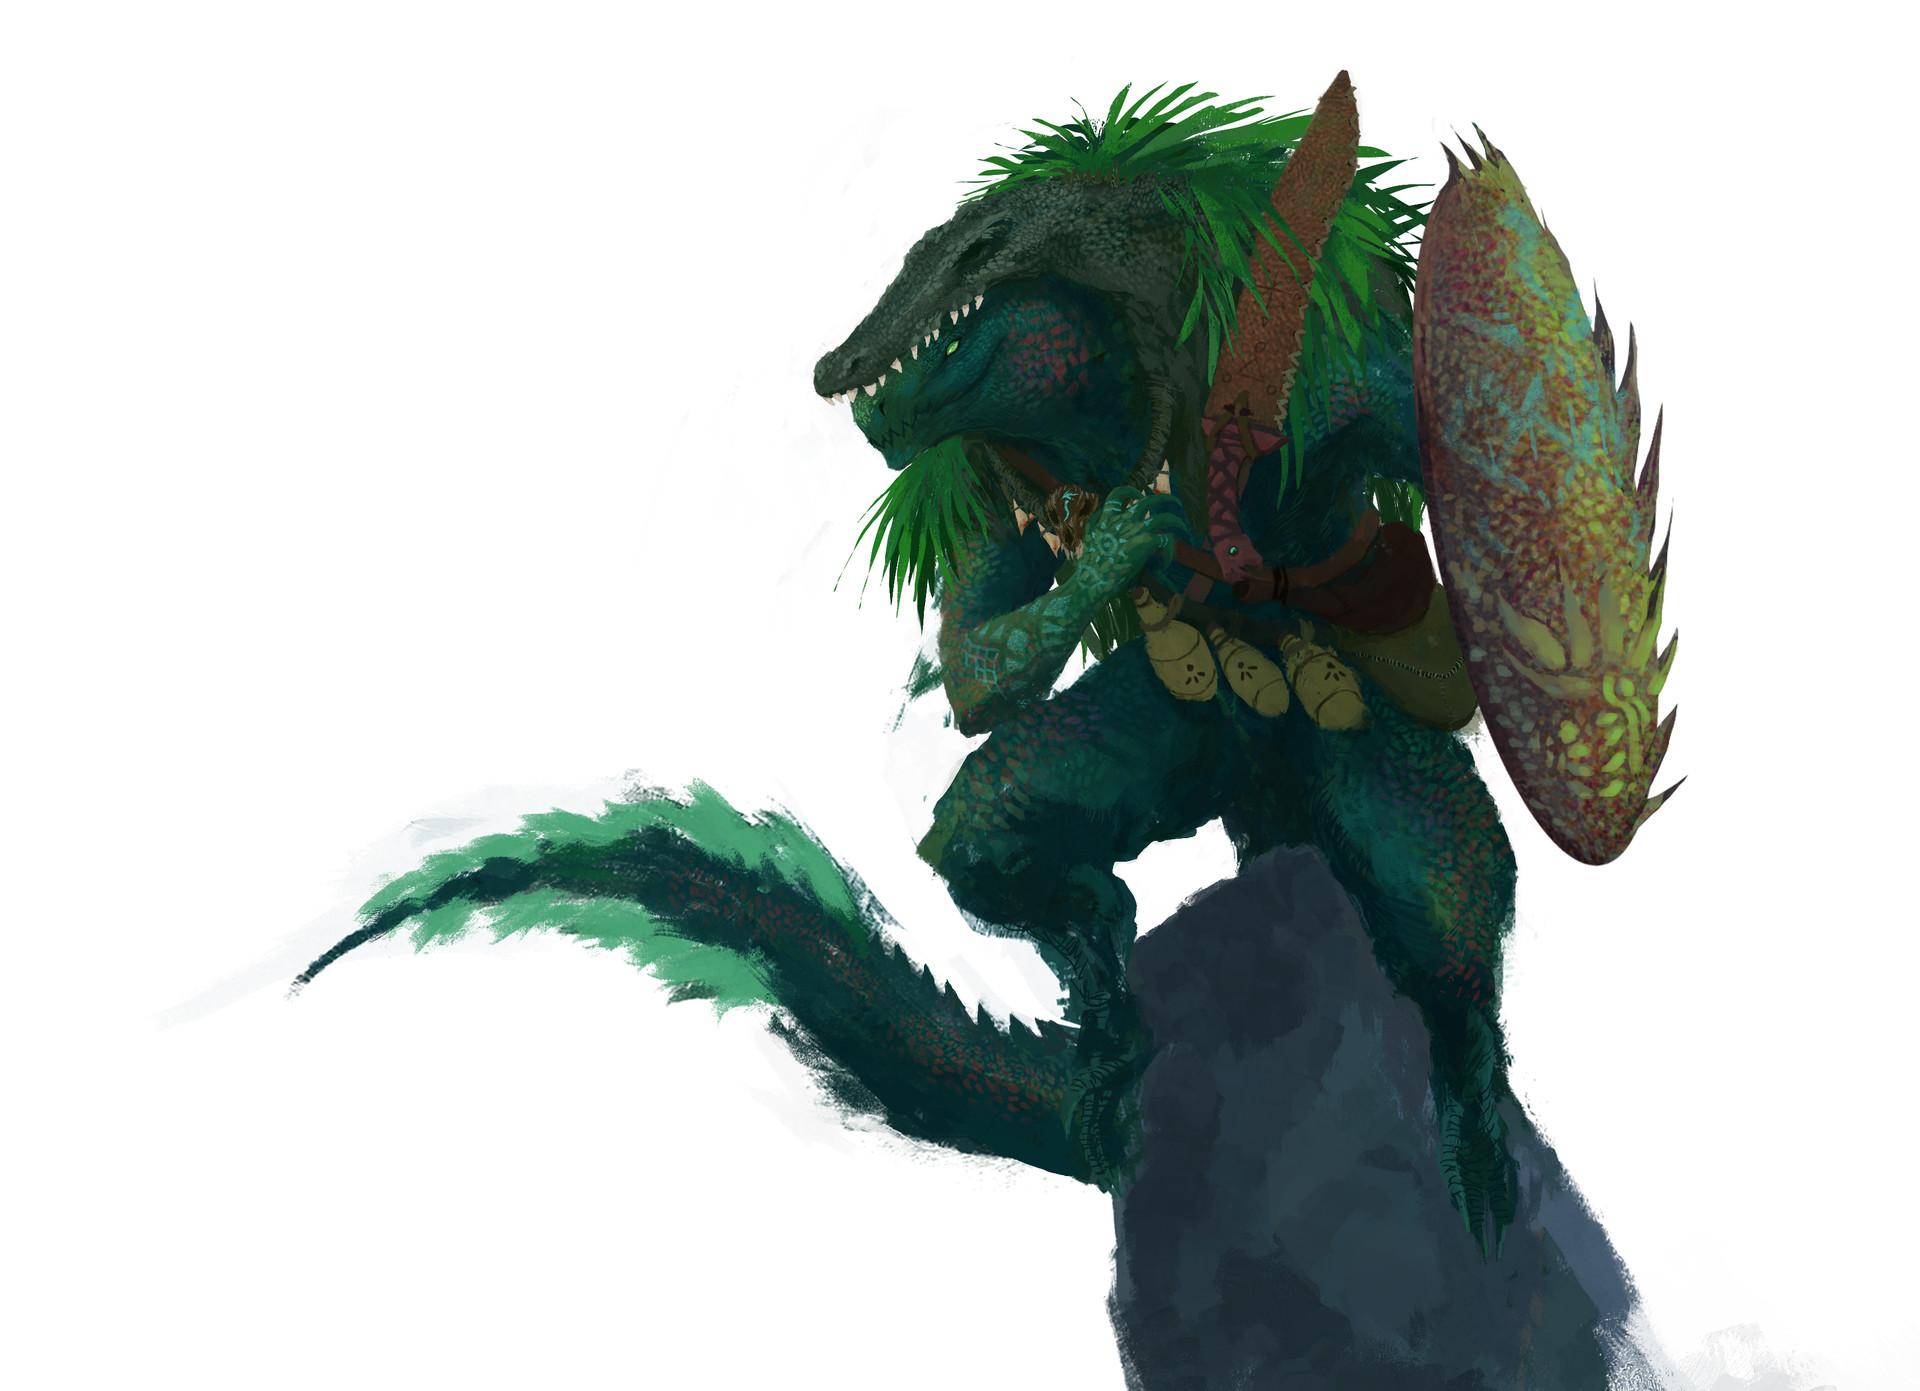 ArtStation - Lizardfolk Druid, Zack Castro